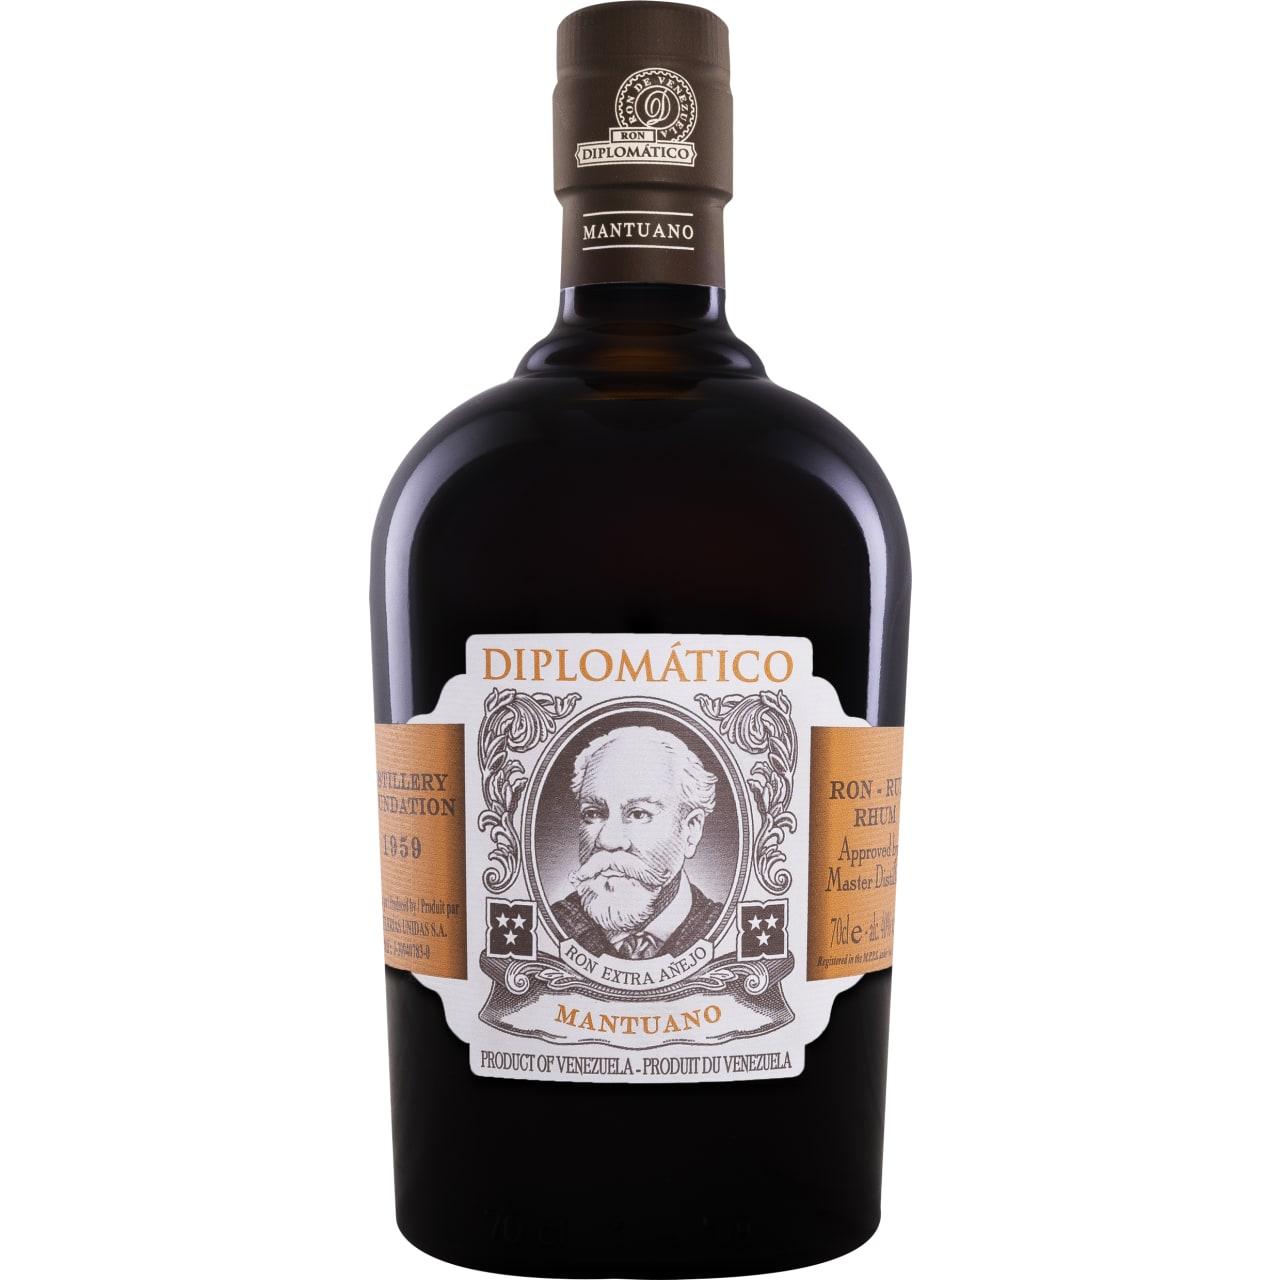 Product Image - Diplomatico Mantuano Rum